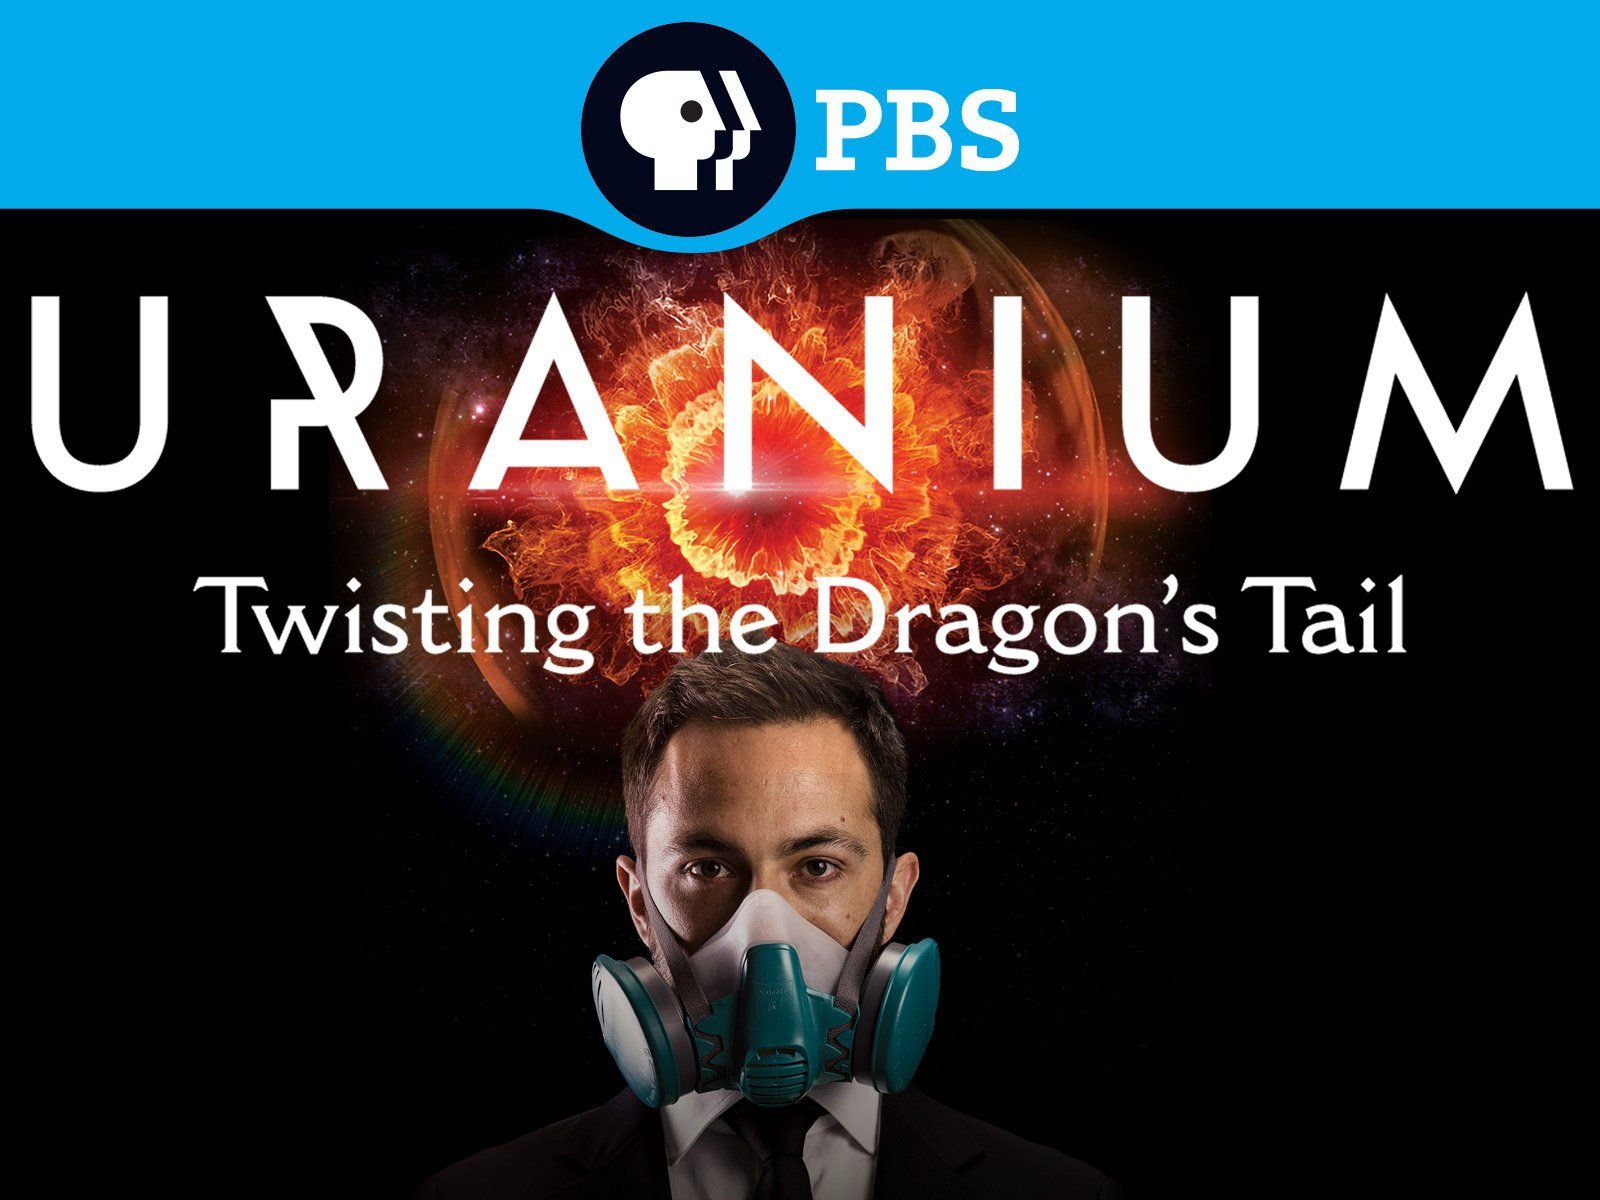 Uranium: Twisting the Dragon's Tail - Season 1